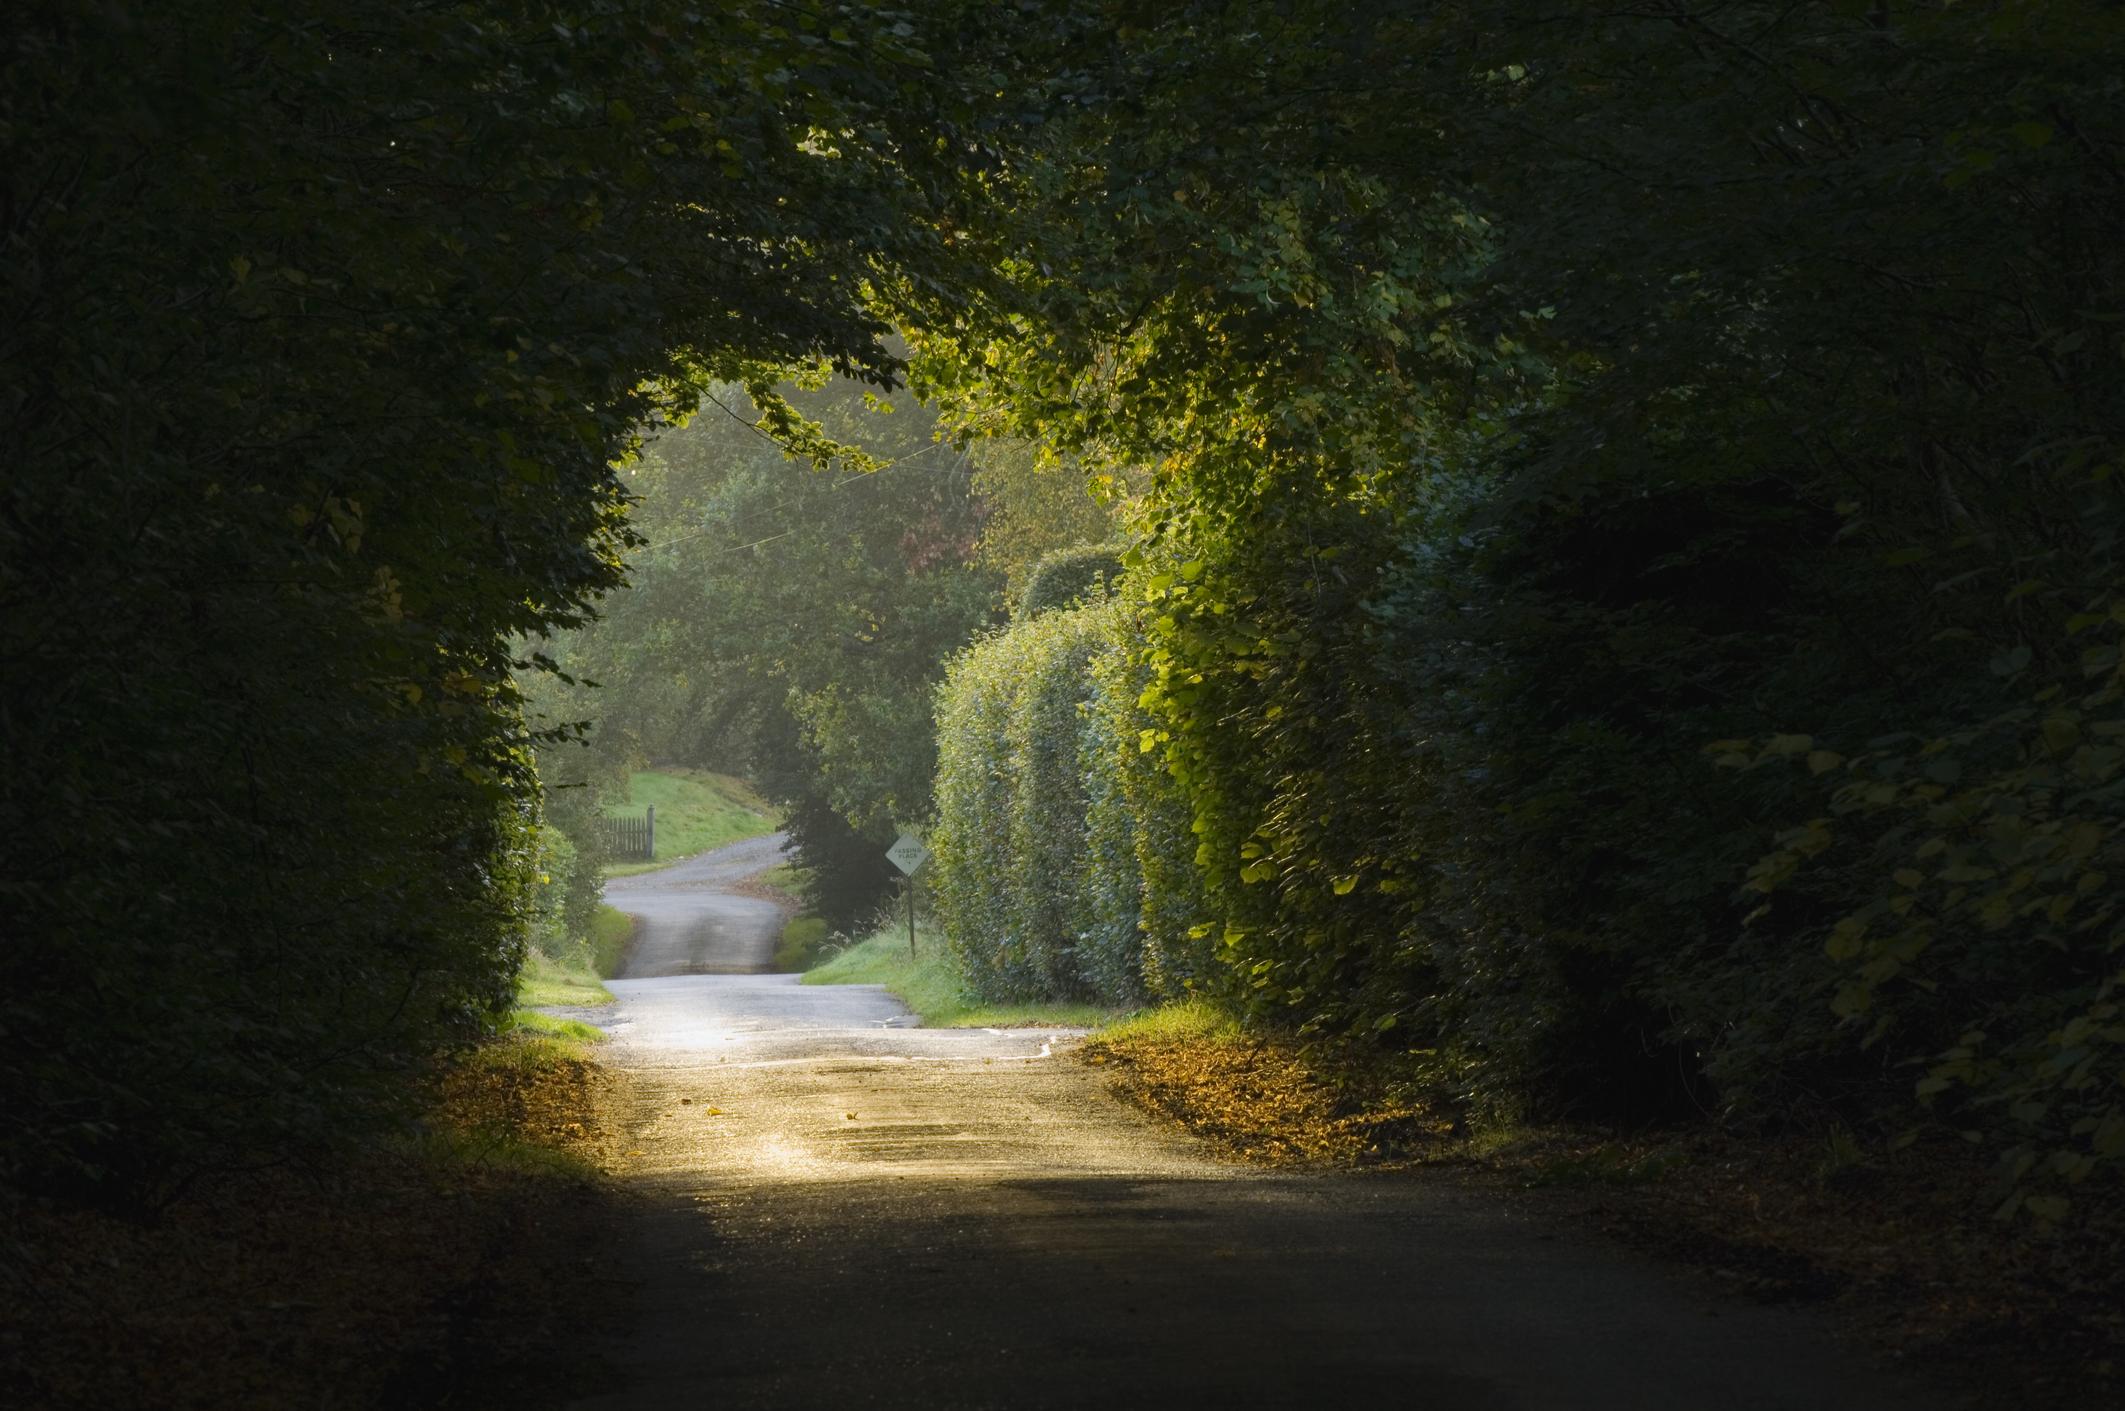 Road under tree arbort.jpg